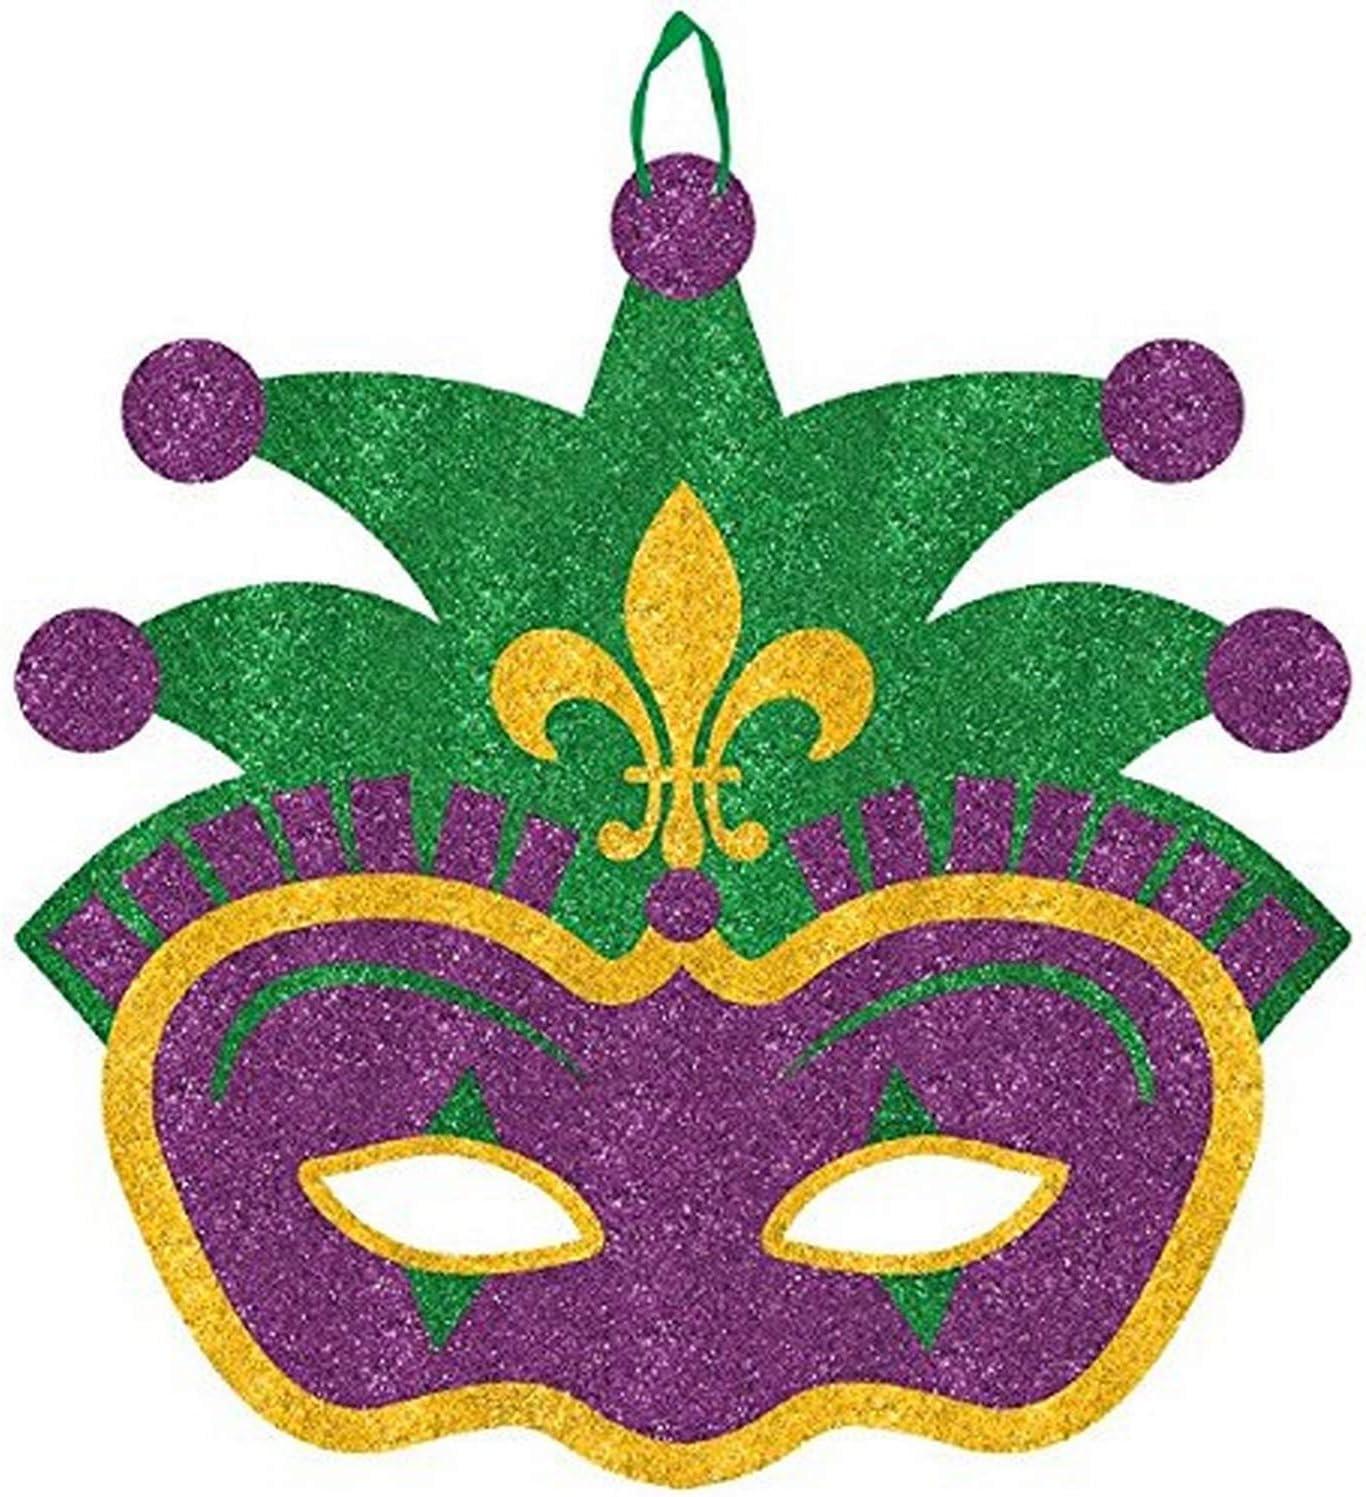 "Amscan Jester Mask, 11 1/2"" x 11 1/2"", Multicolor"